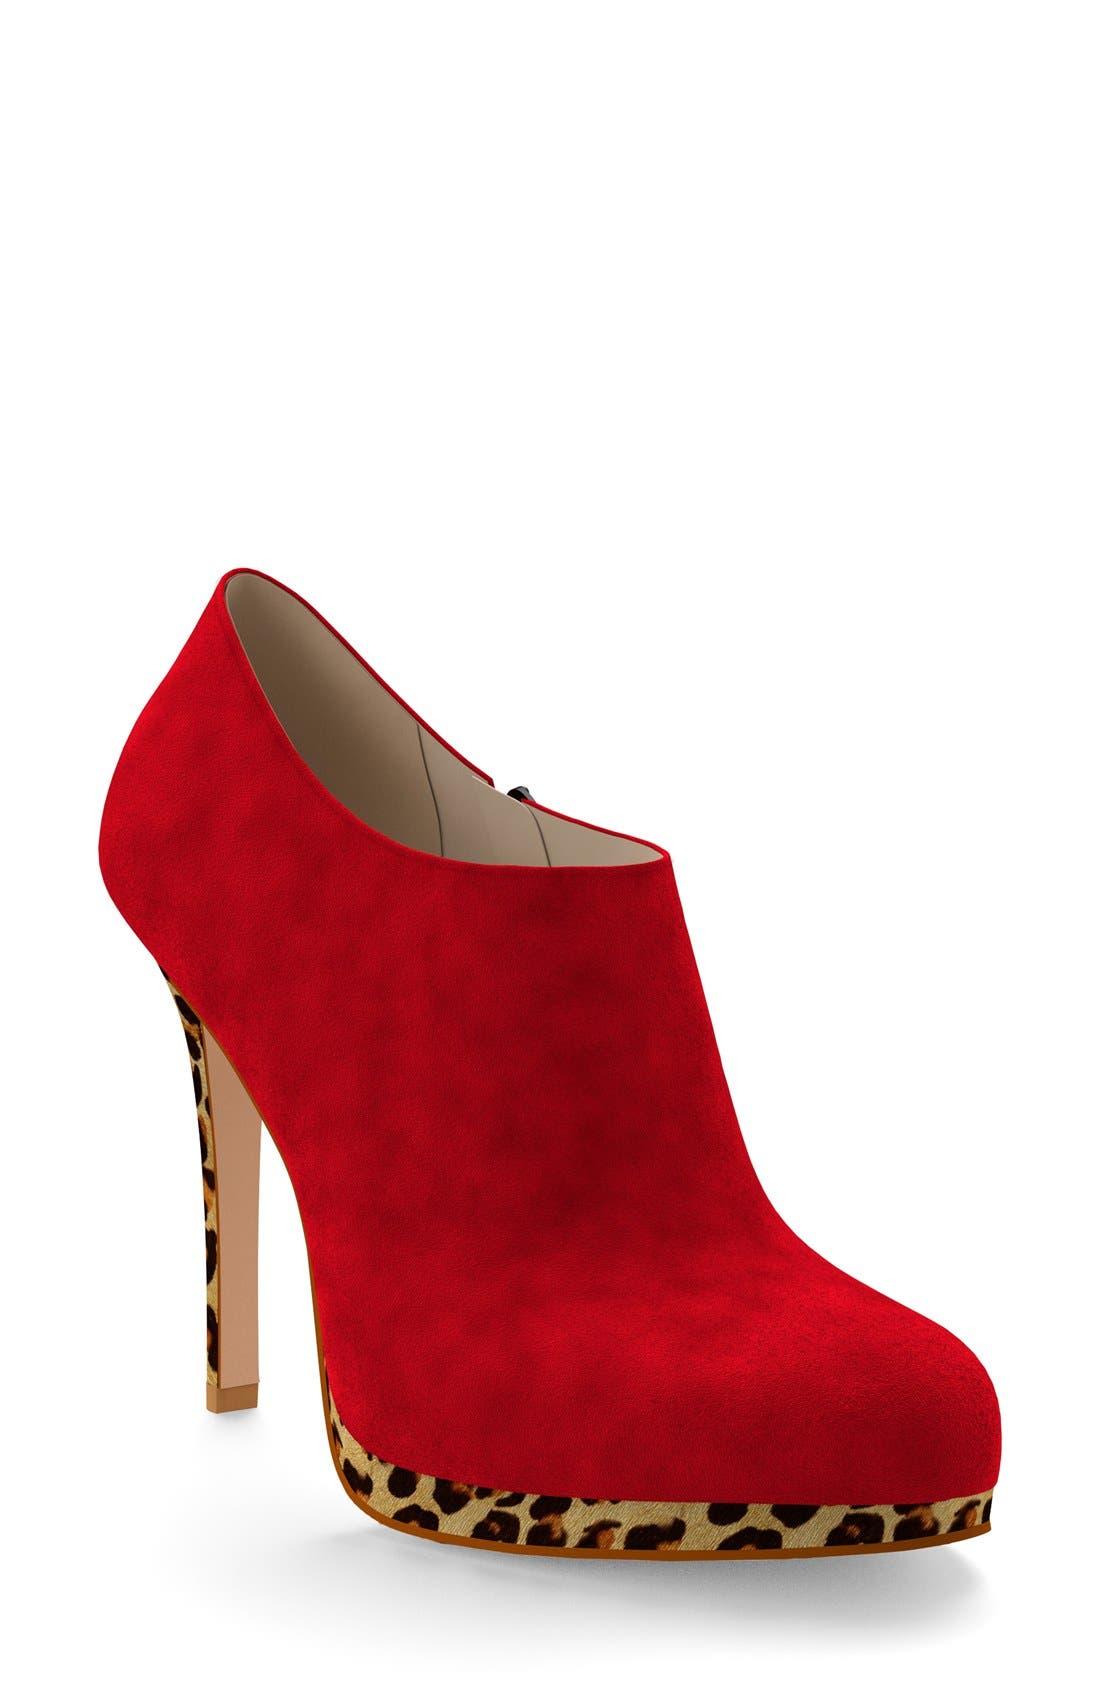 Alternate Image 1 Selected - Shoes of Prey Platform Bootie (Women) (Nordstrom Exclusive)